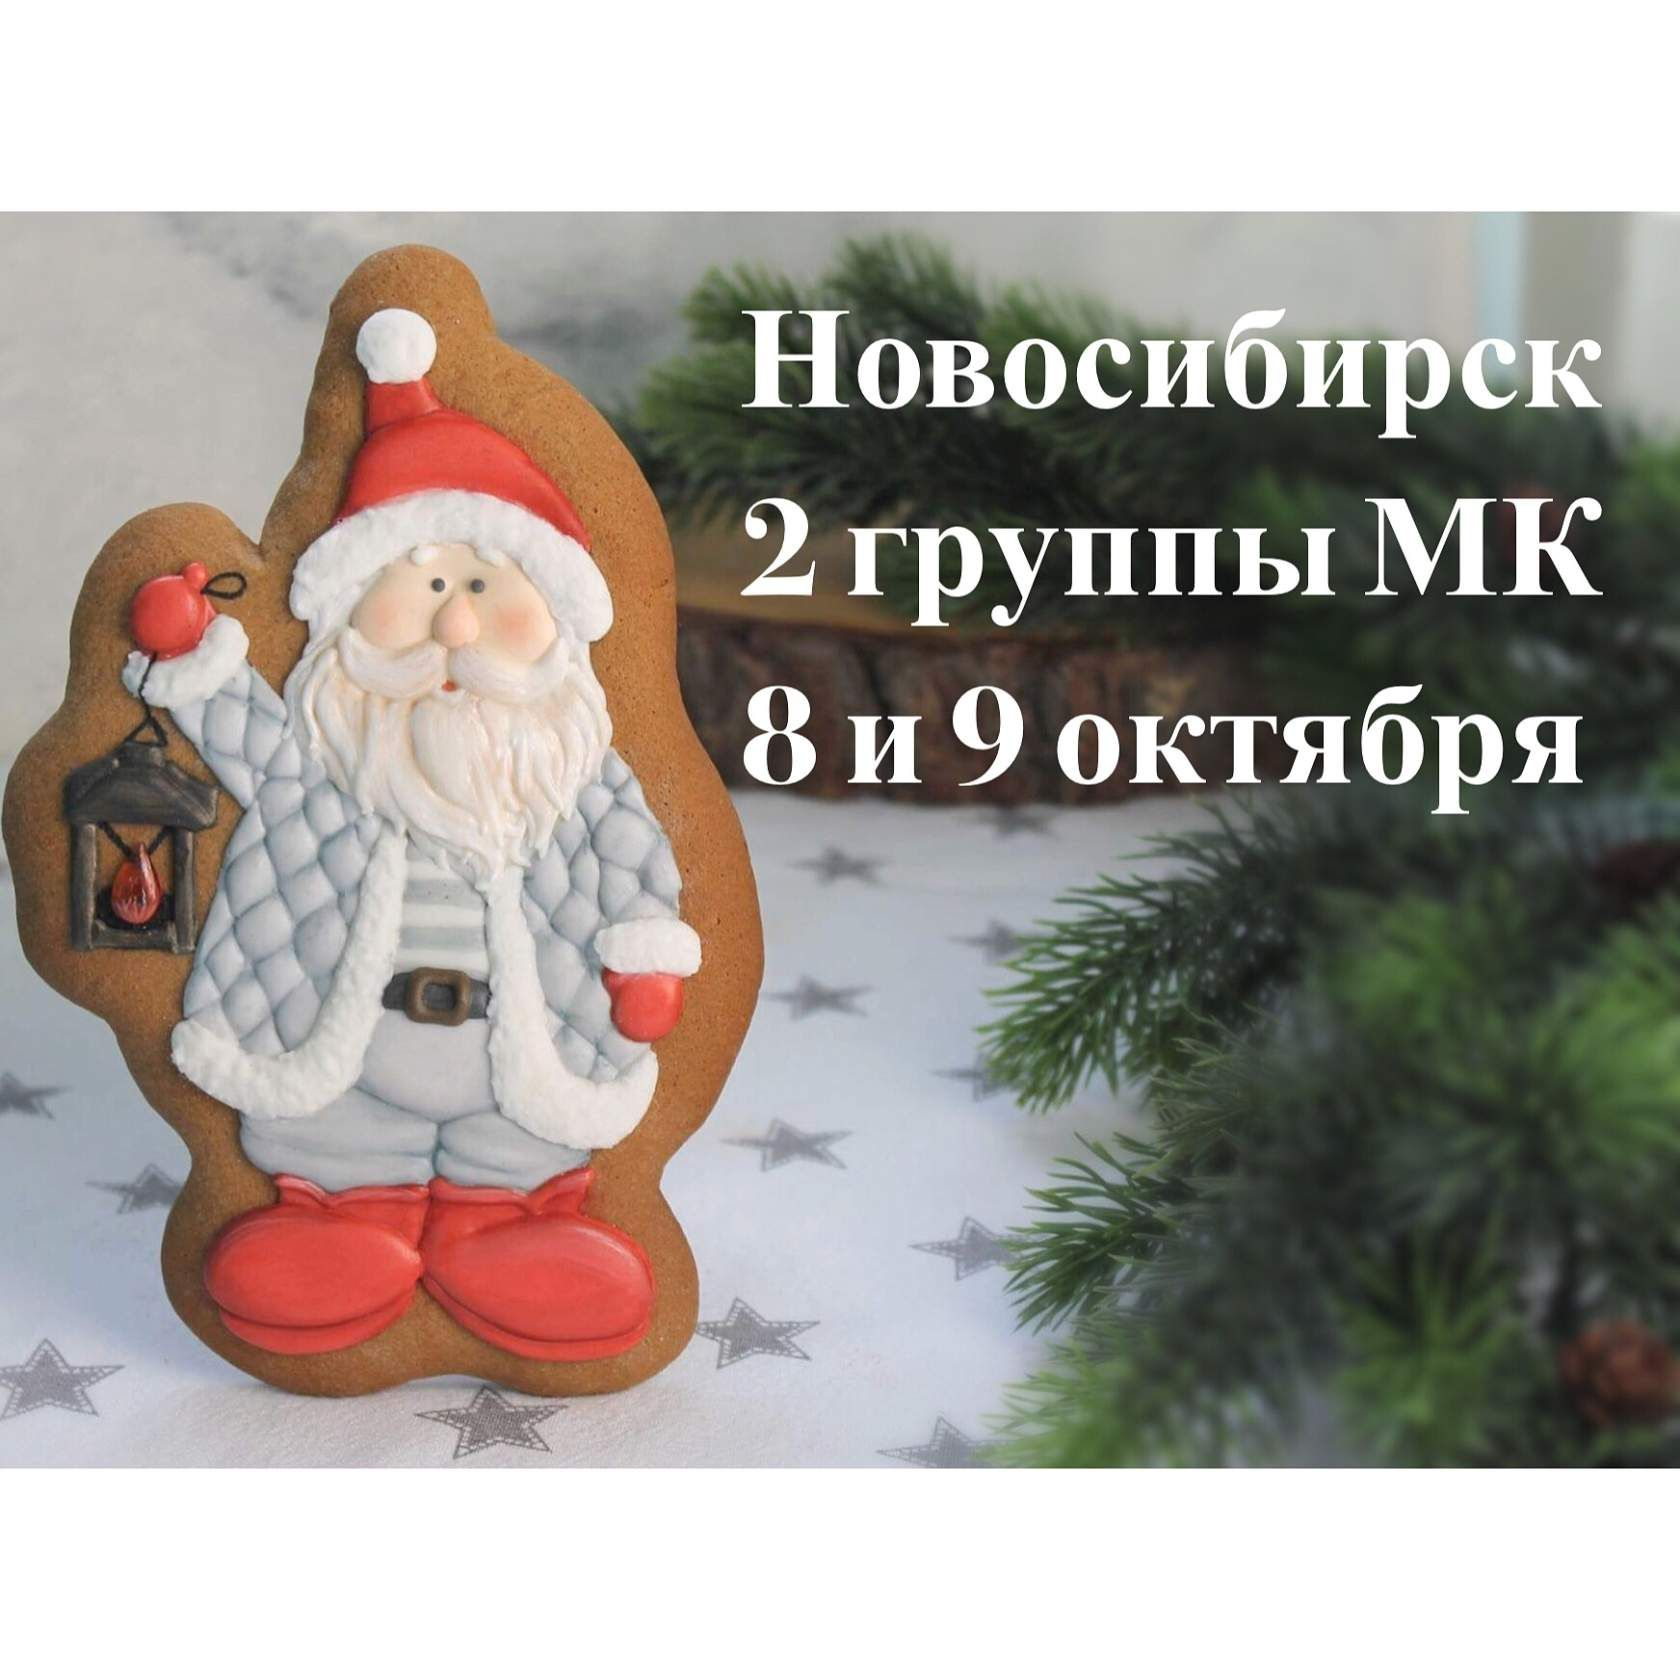 Пряники Томск - Разное | OK.RU